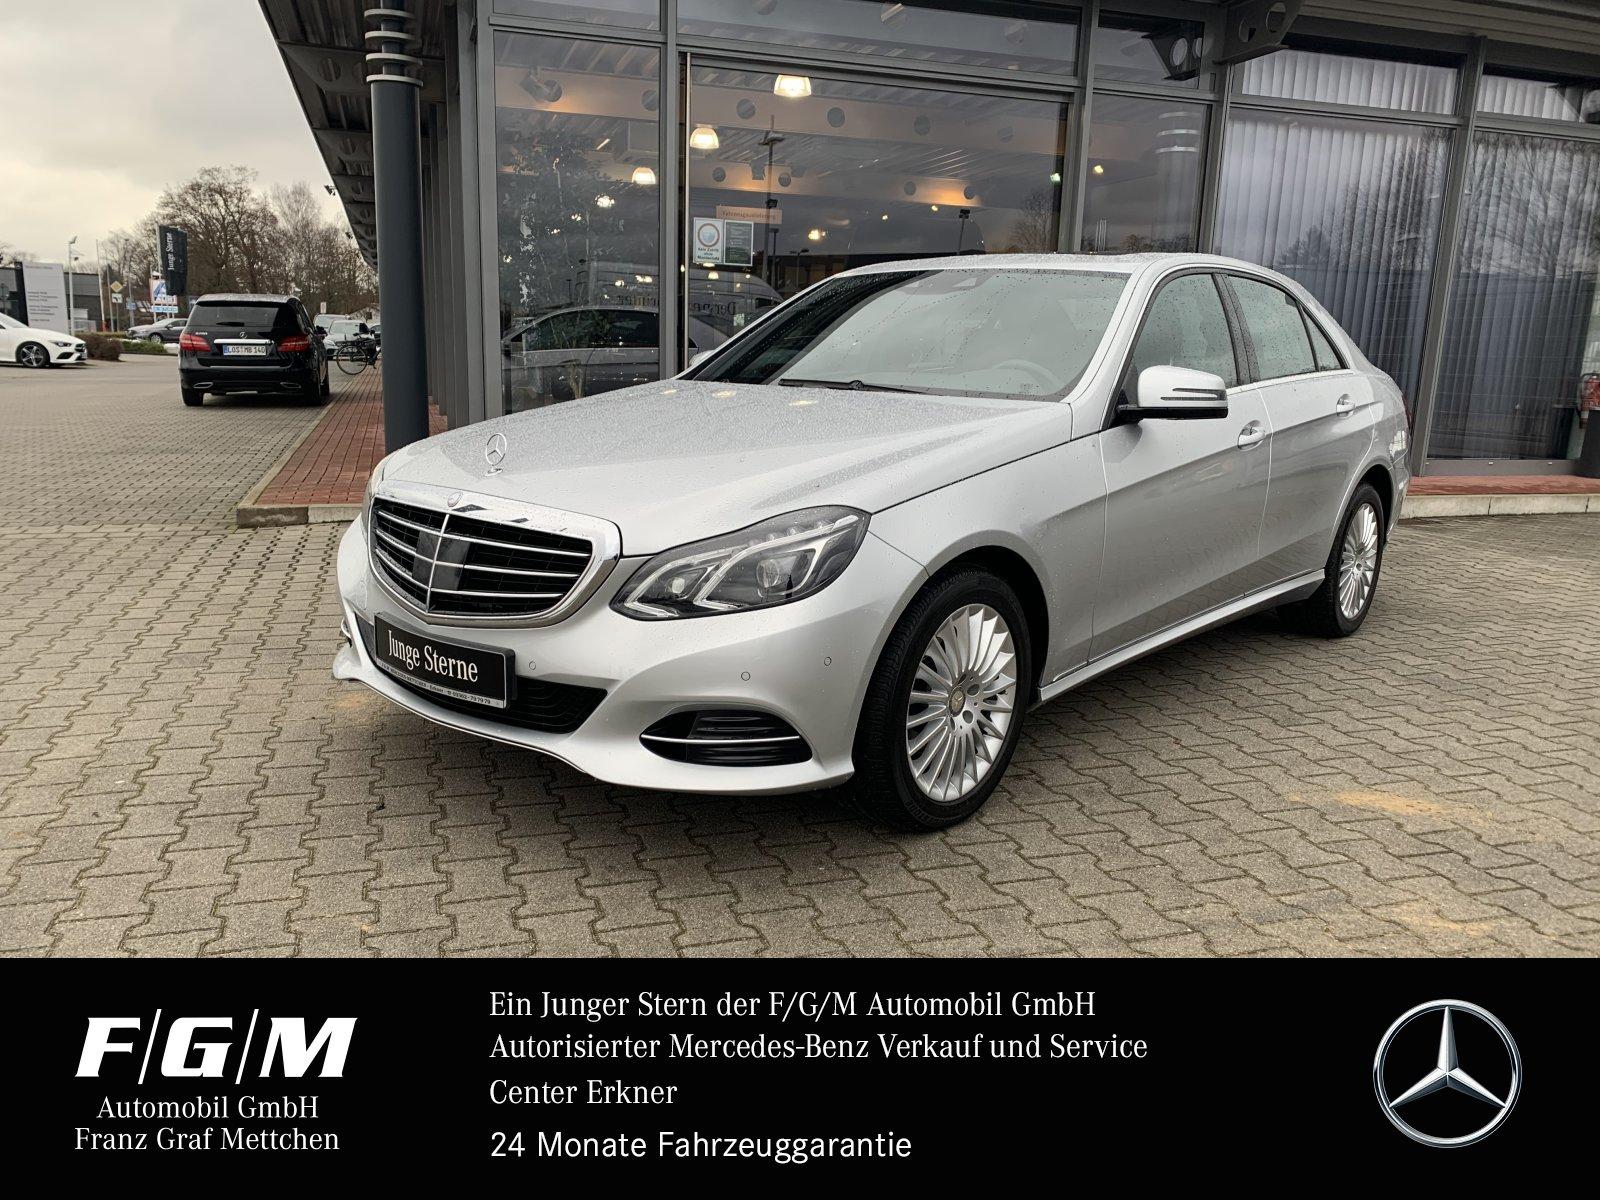 Mercedes-Benz E 200 Elegance/Navi/SHD/Distr/LED-ILS/Parktronic, Jahr 2013, Benzin